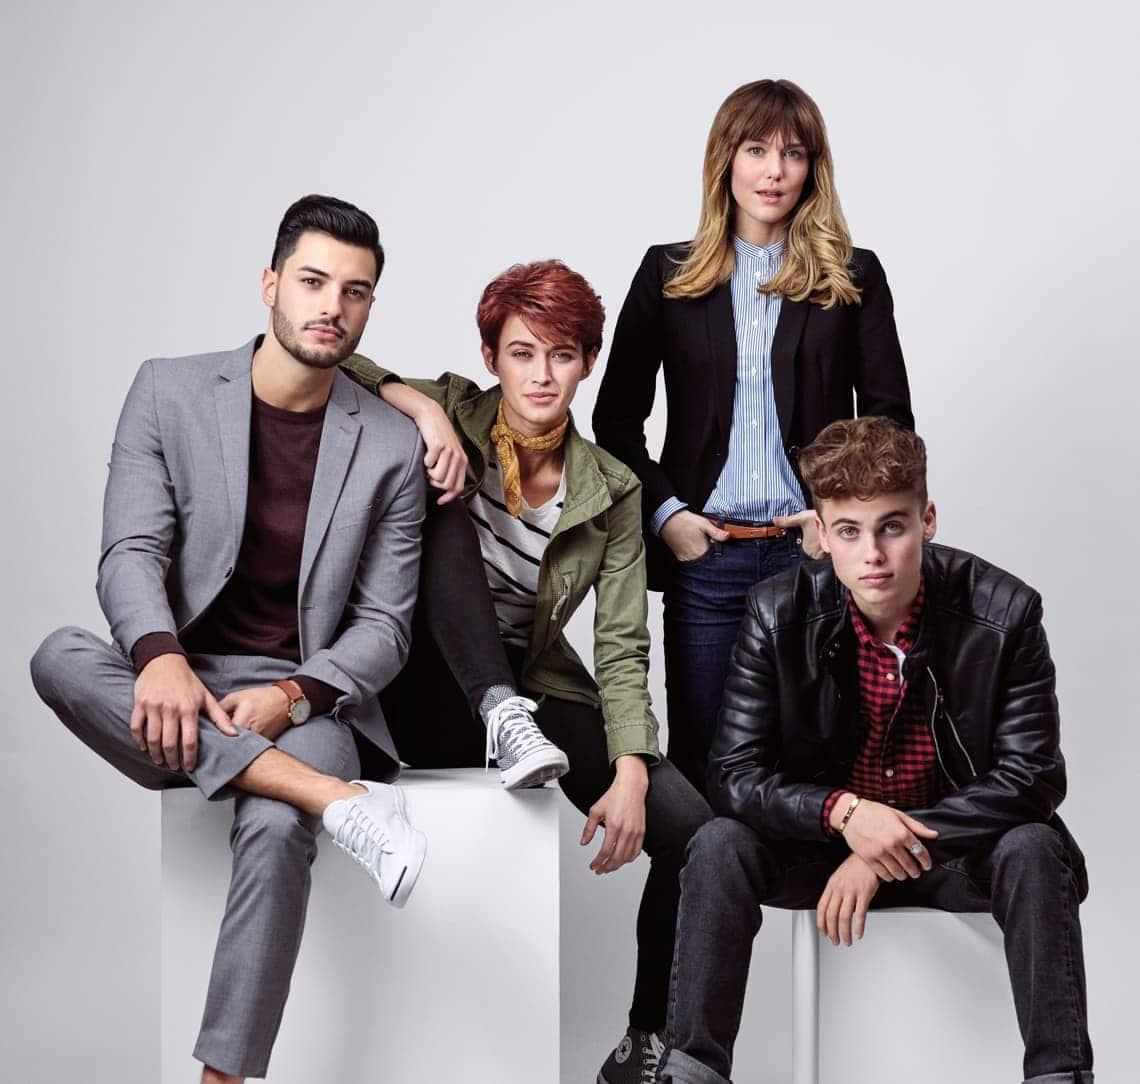 Fantastic Sams photo shoot image